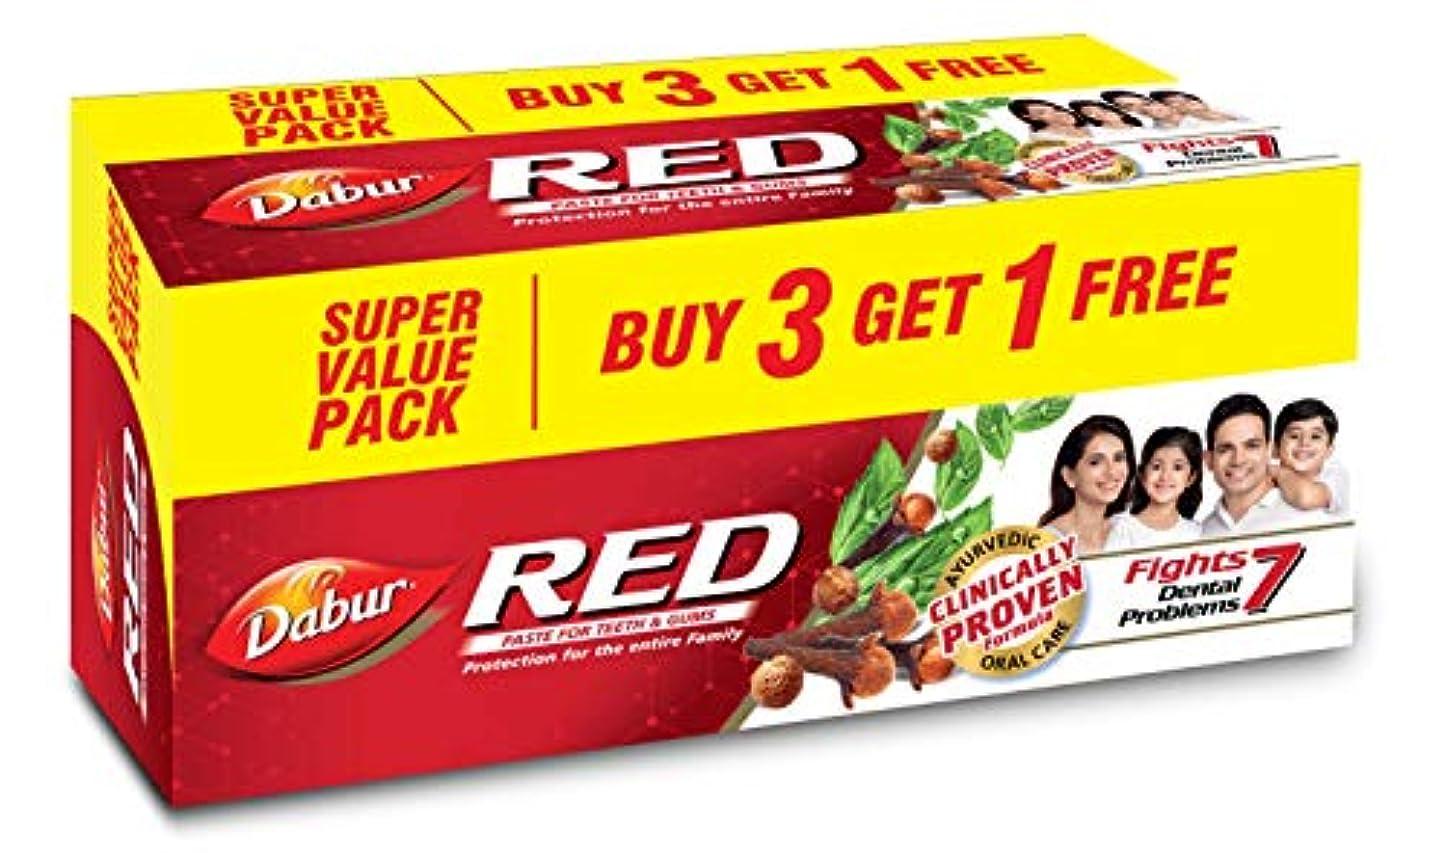 移行死傷者石膏Dabur Red Paste - 200g (Buy 3 Get 1 Free)